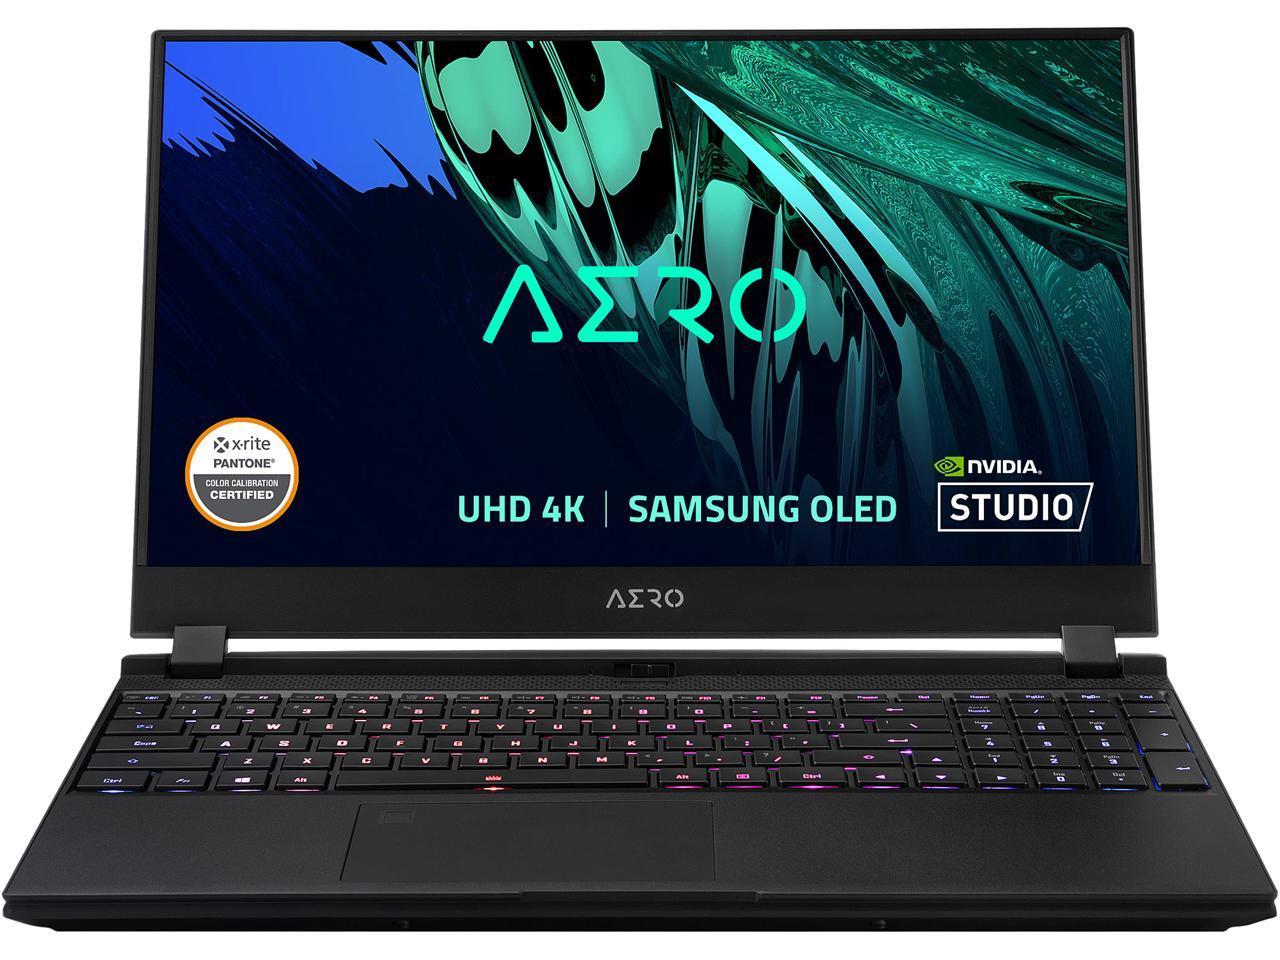 "Gigabyte Aero 15 OLED YD: 15.6"" 4K AMOLED, i7-11800H, RTX 3080, 16GB DDR4, 1TB PCIe Gen 4 SSD, Thunderbolt 4, Win10 Pro @ $1569 AR + F/S"